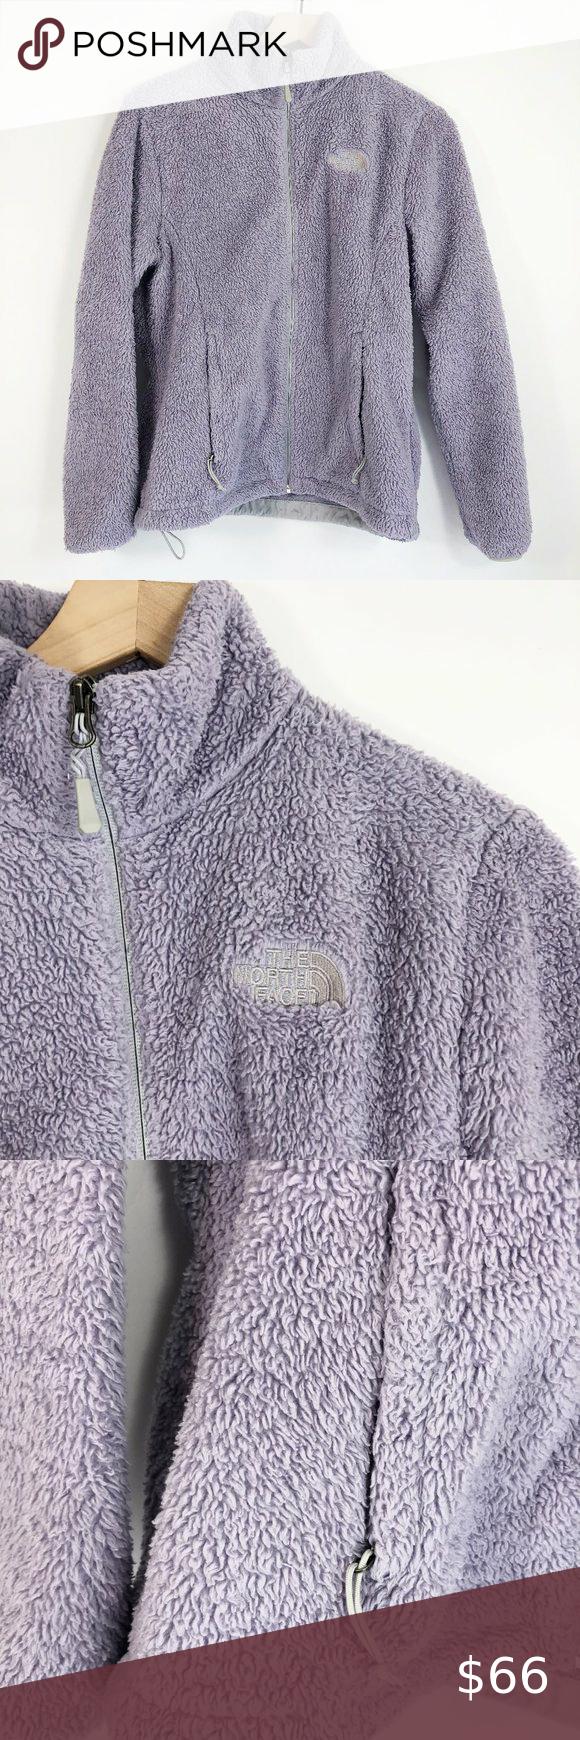 The North Face Ashen Purple Osito Fleece Jacket M Fleece Jacket North Face Jacket Jacket Style [ 1740 x 580 Pixel ]